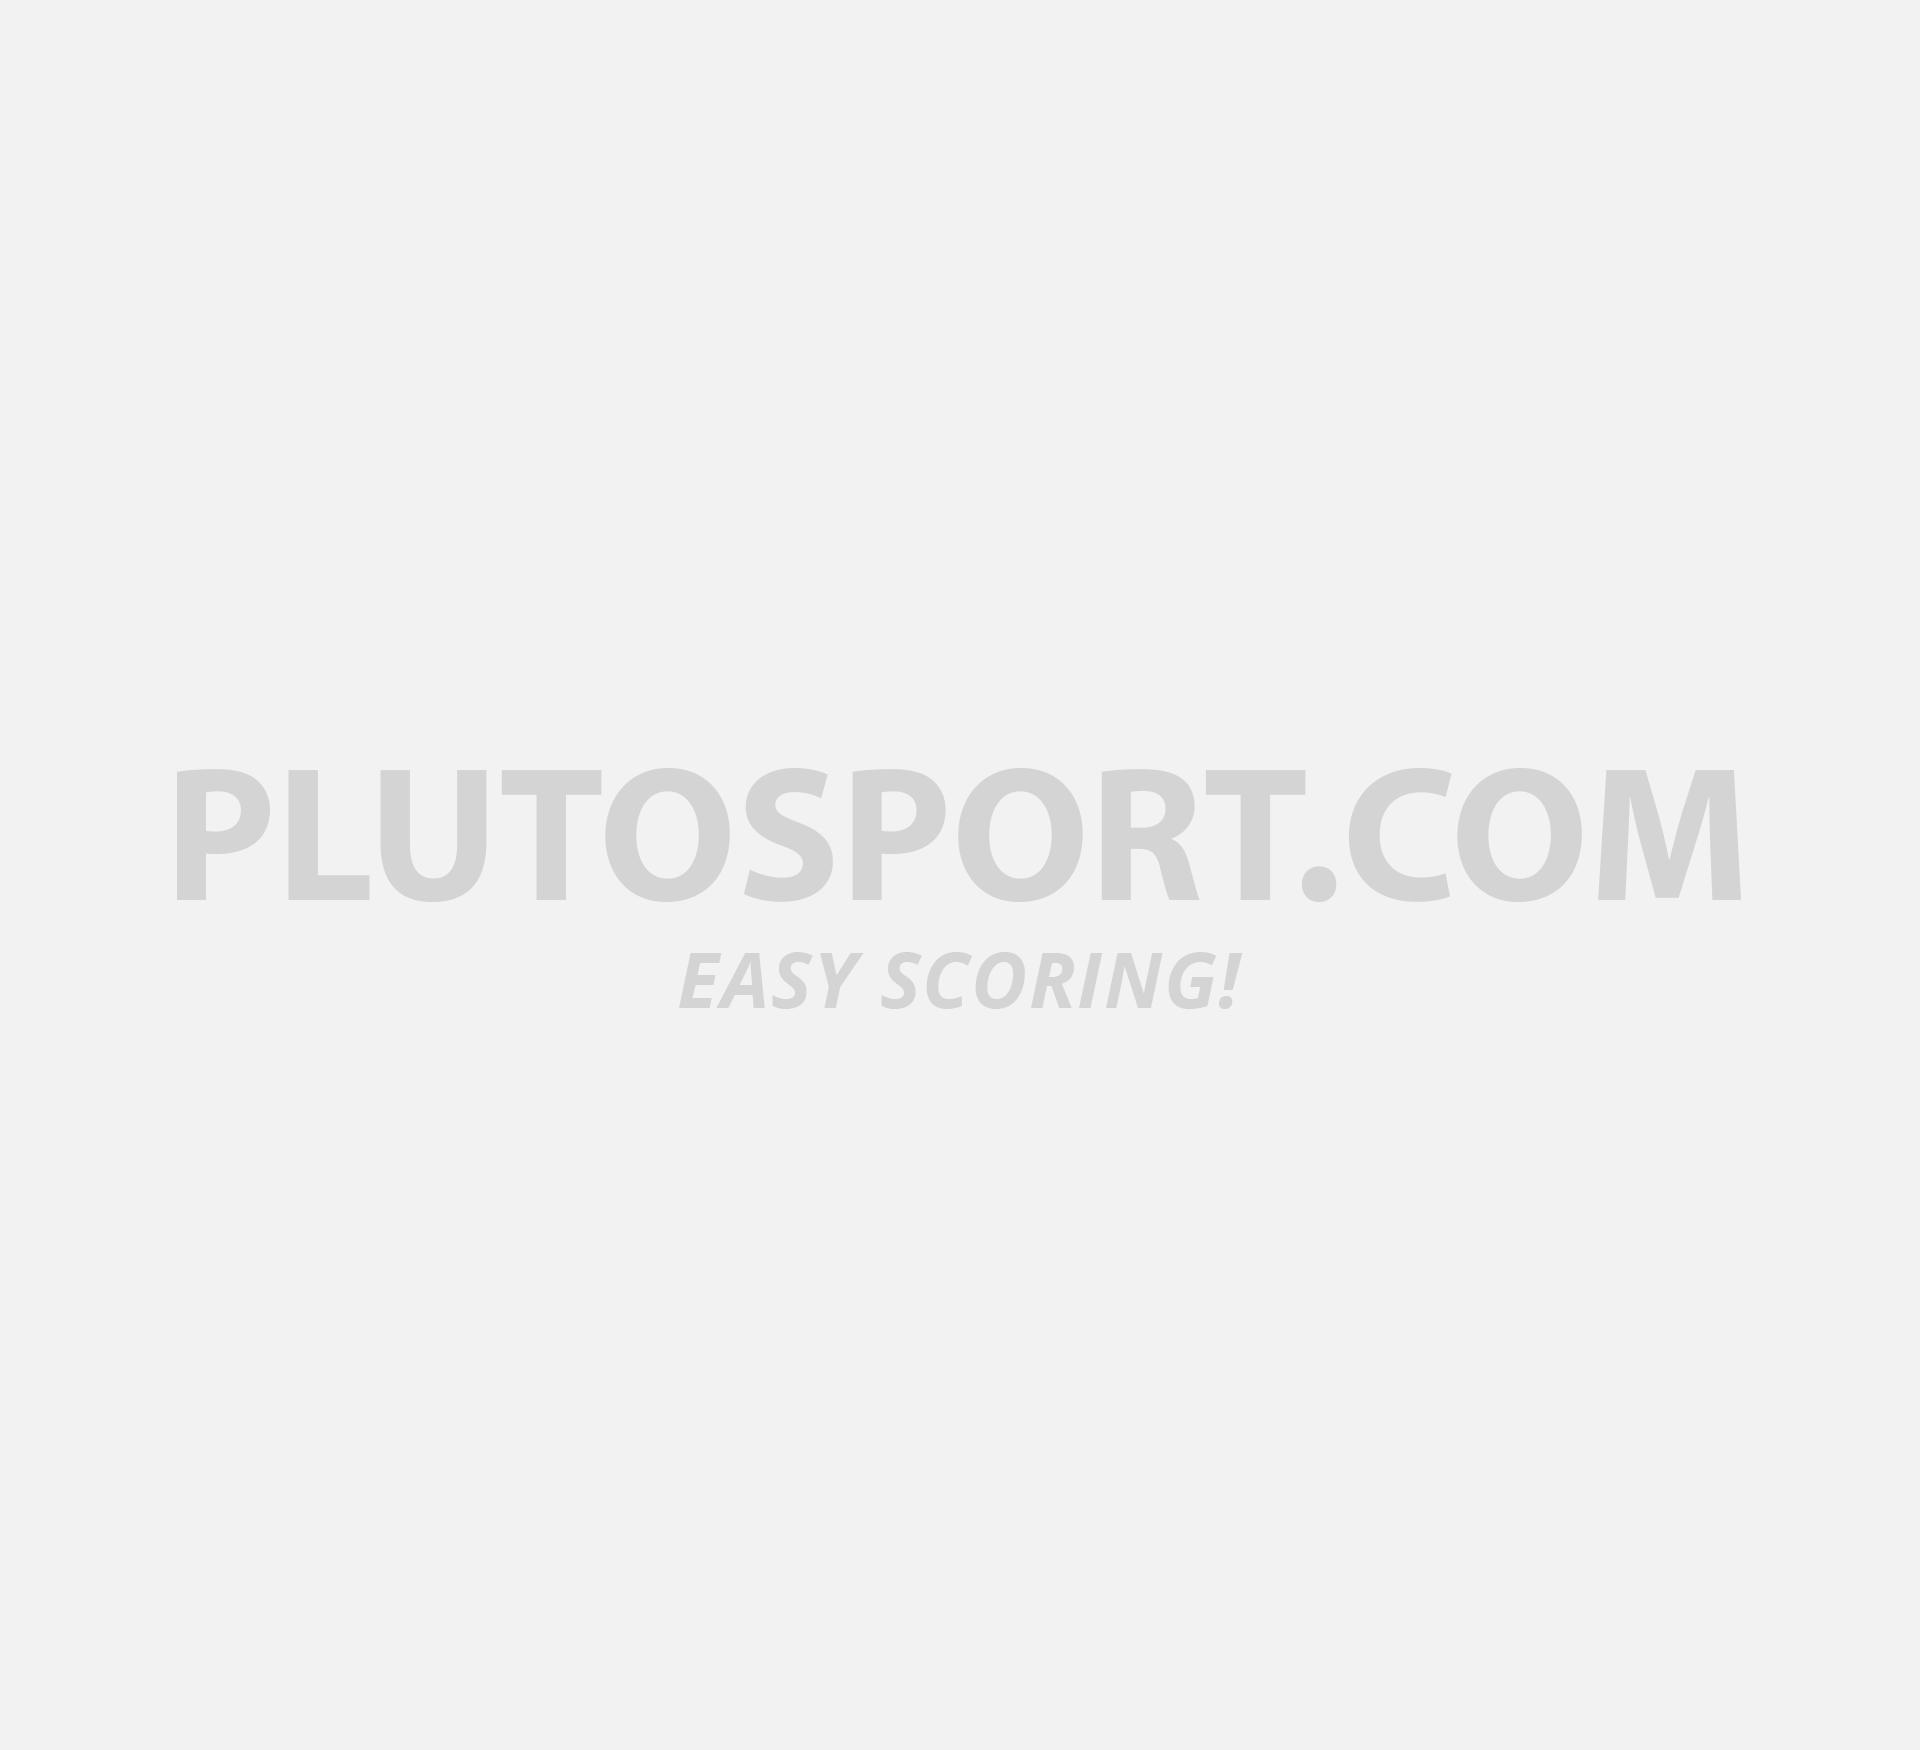 Asics Gel-dedicate 3 Oc Escarpins De Tennis XrvOzEFX8z